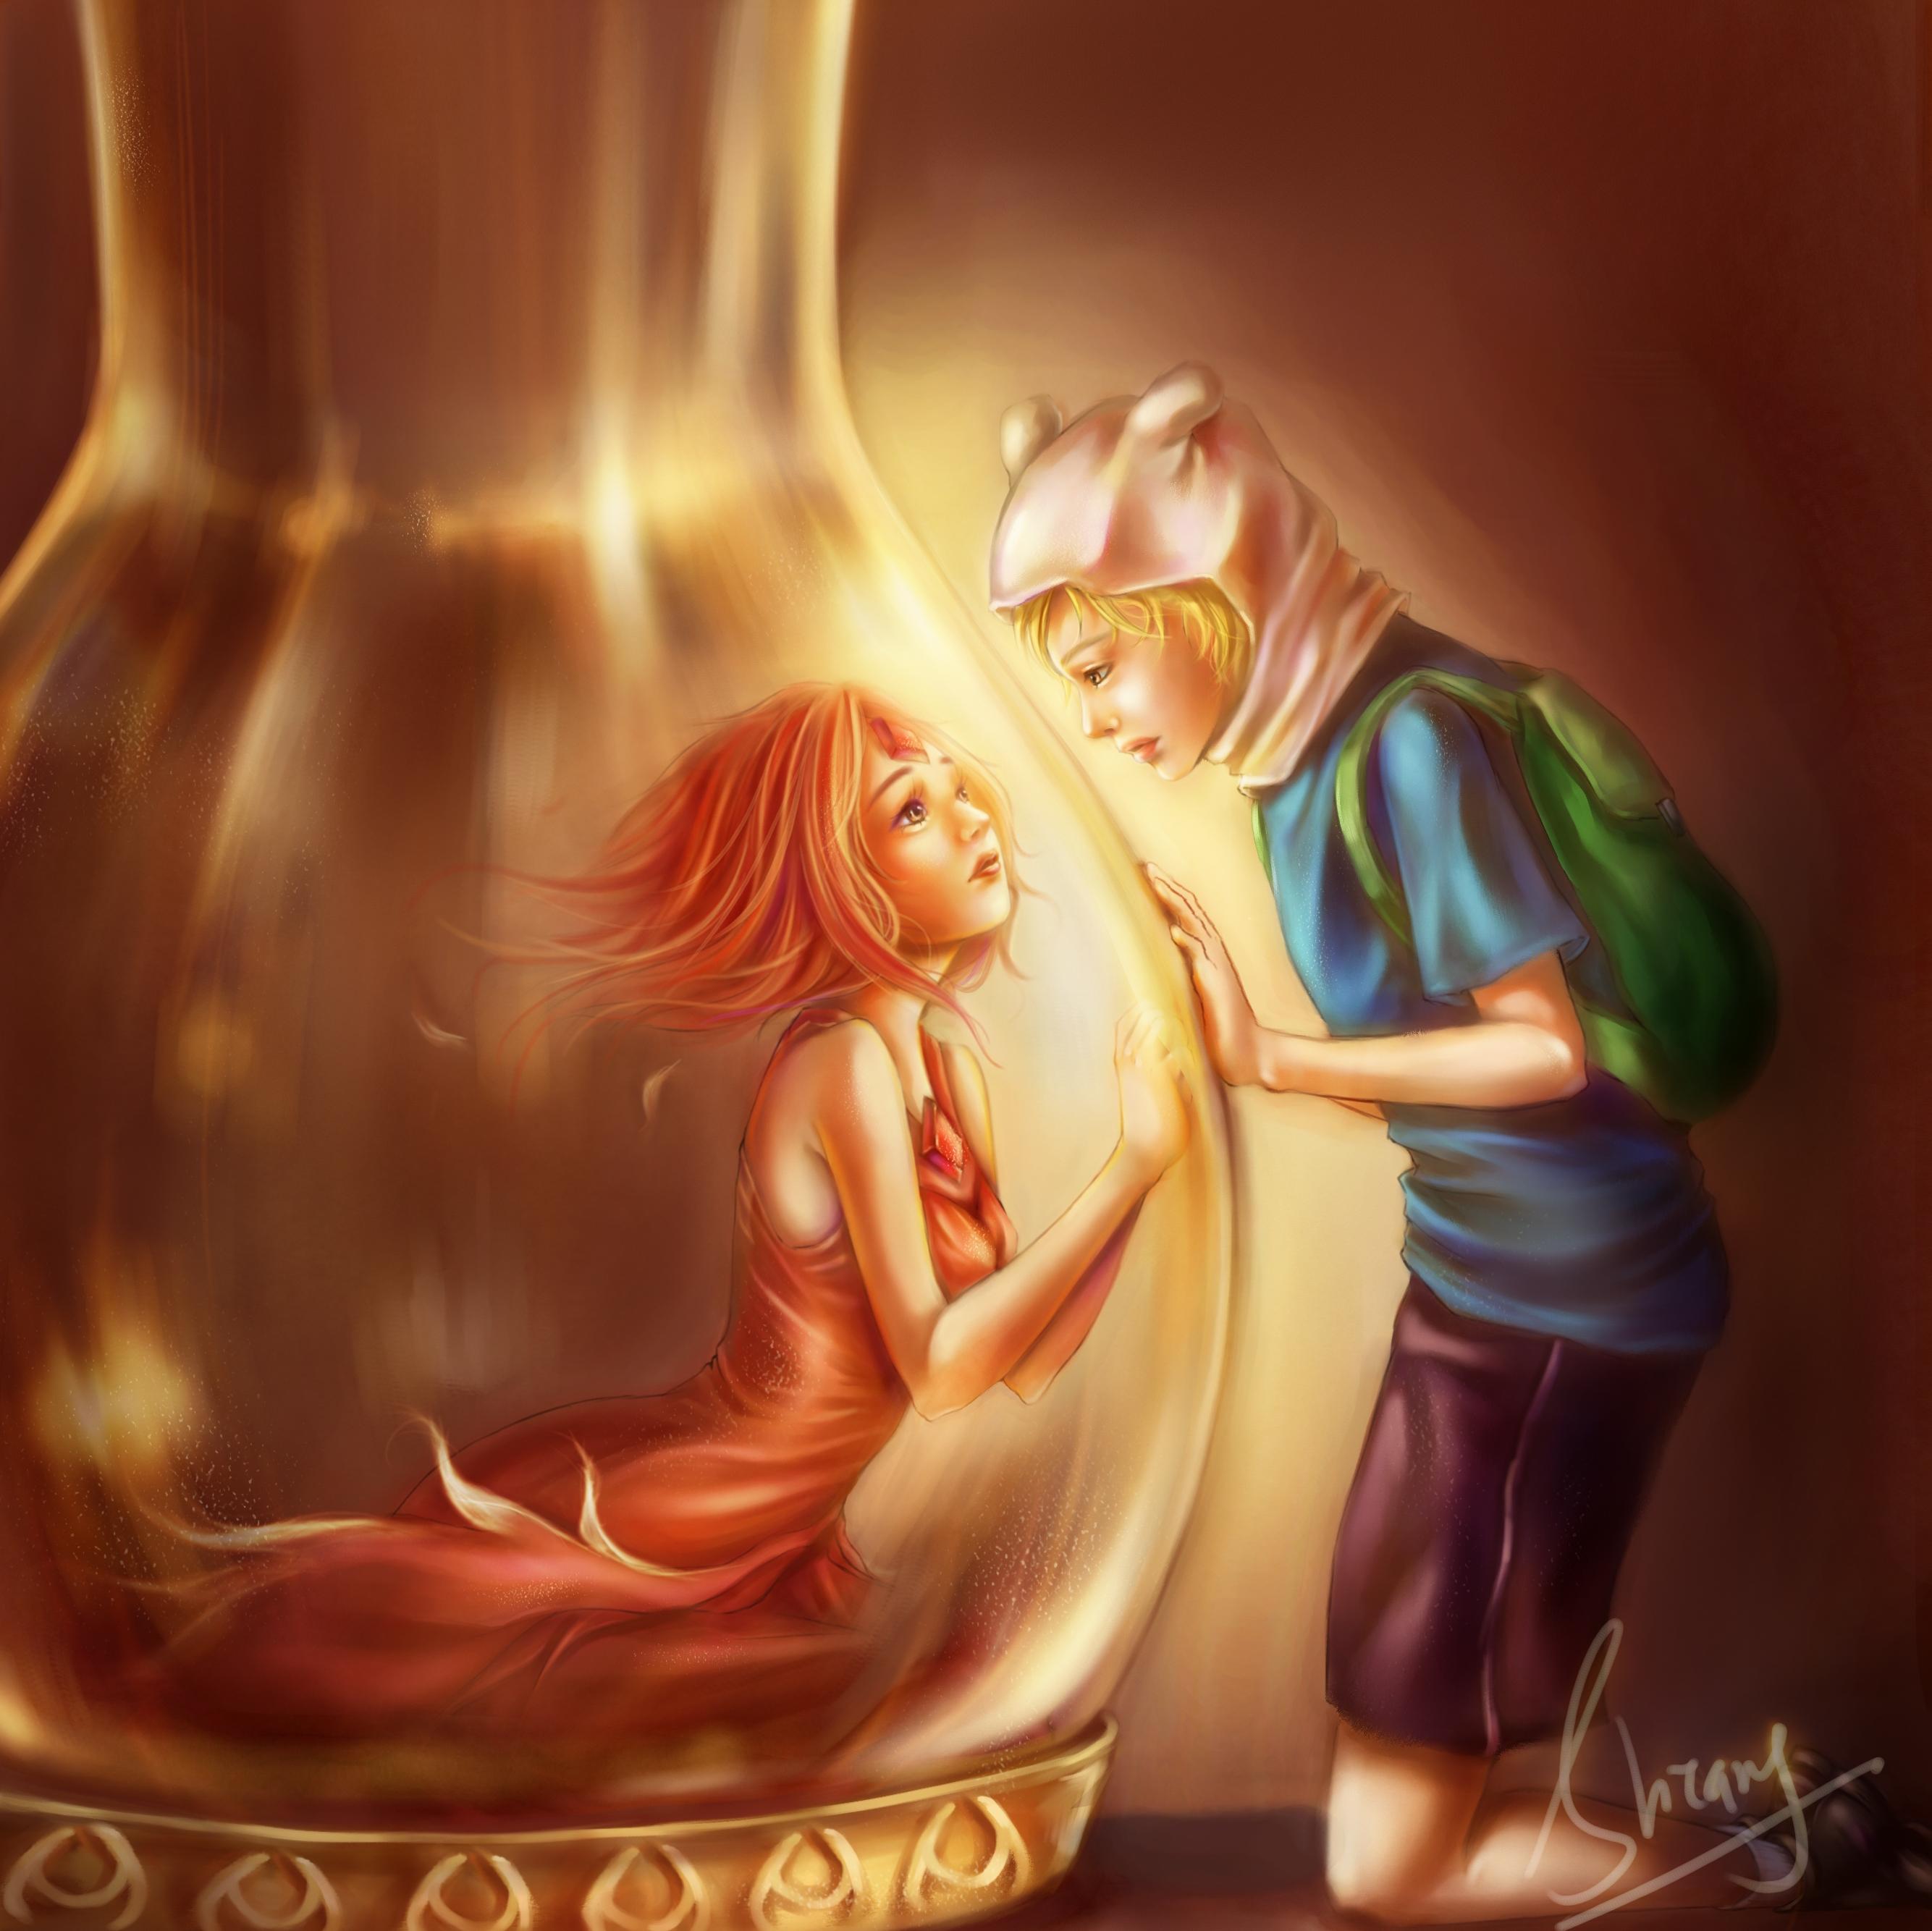 When does finn start dating flame princess